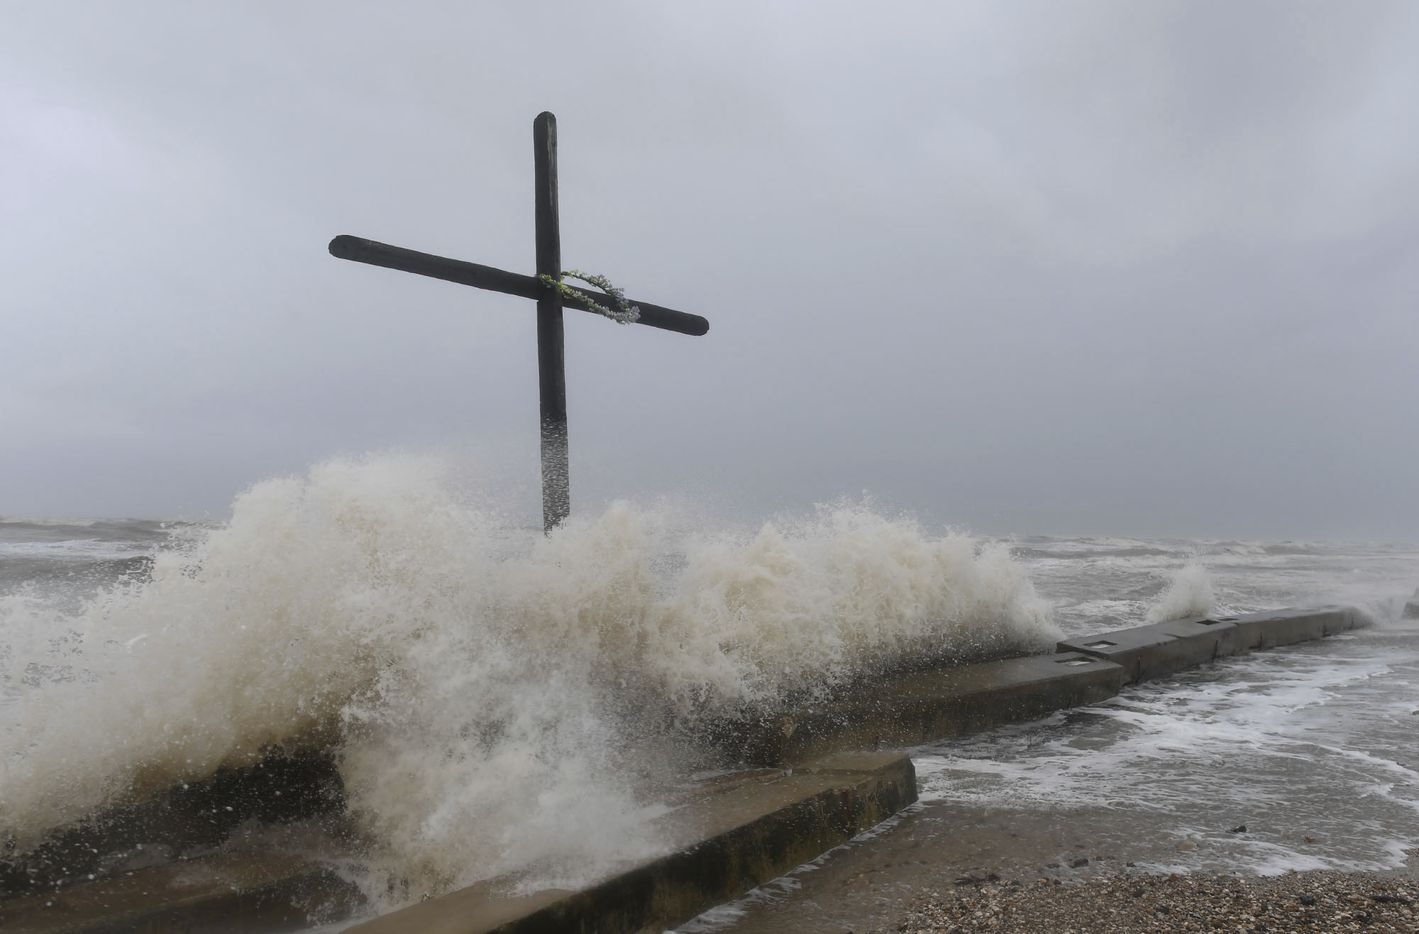 Larger than usual waves crash ashore on Bolivar Peninsula, Friday, Aug. 25, 2017, as Hurricane Harvey approaches Texas.